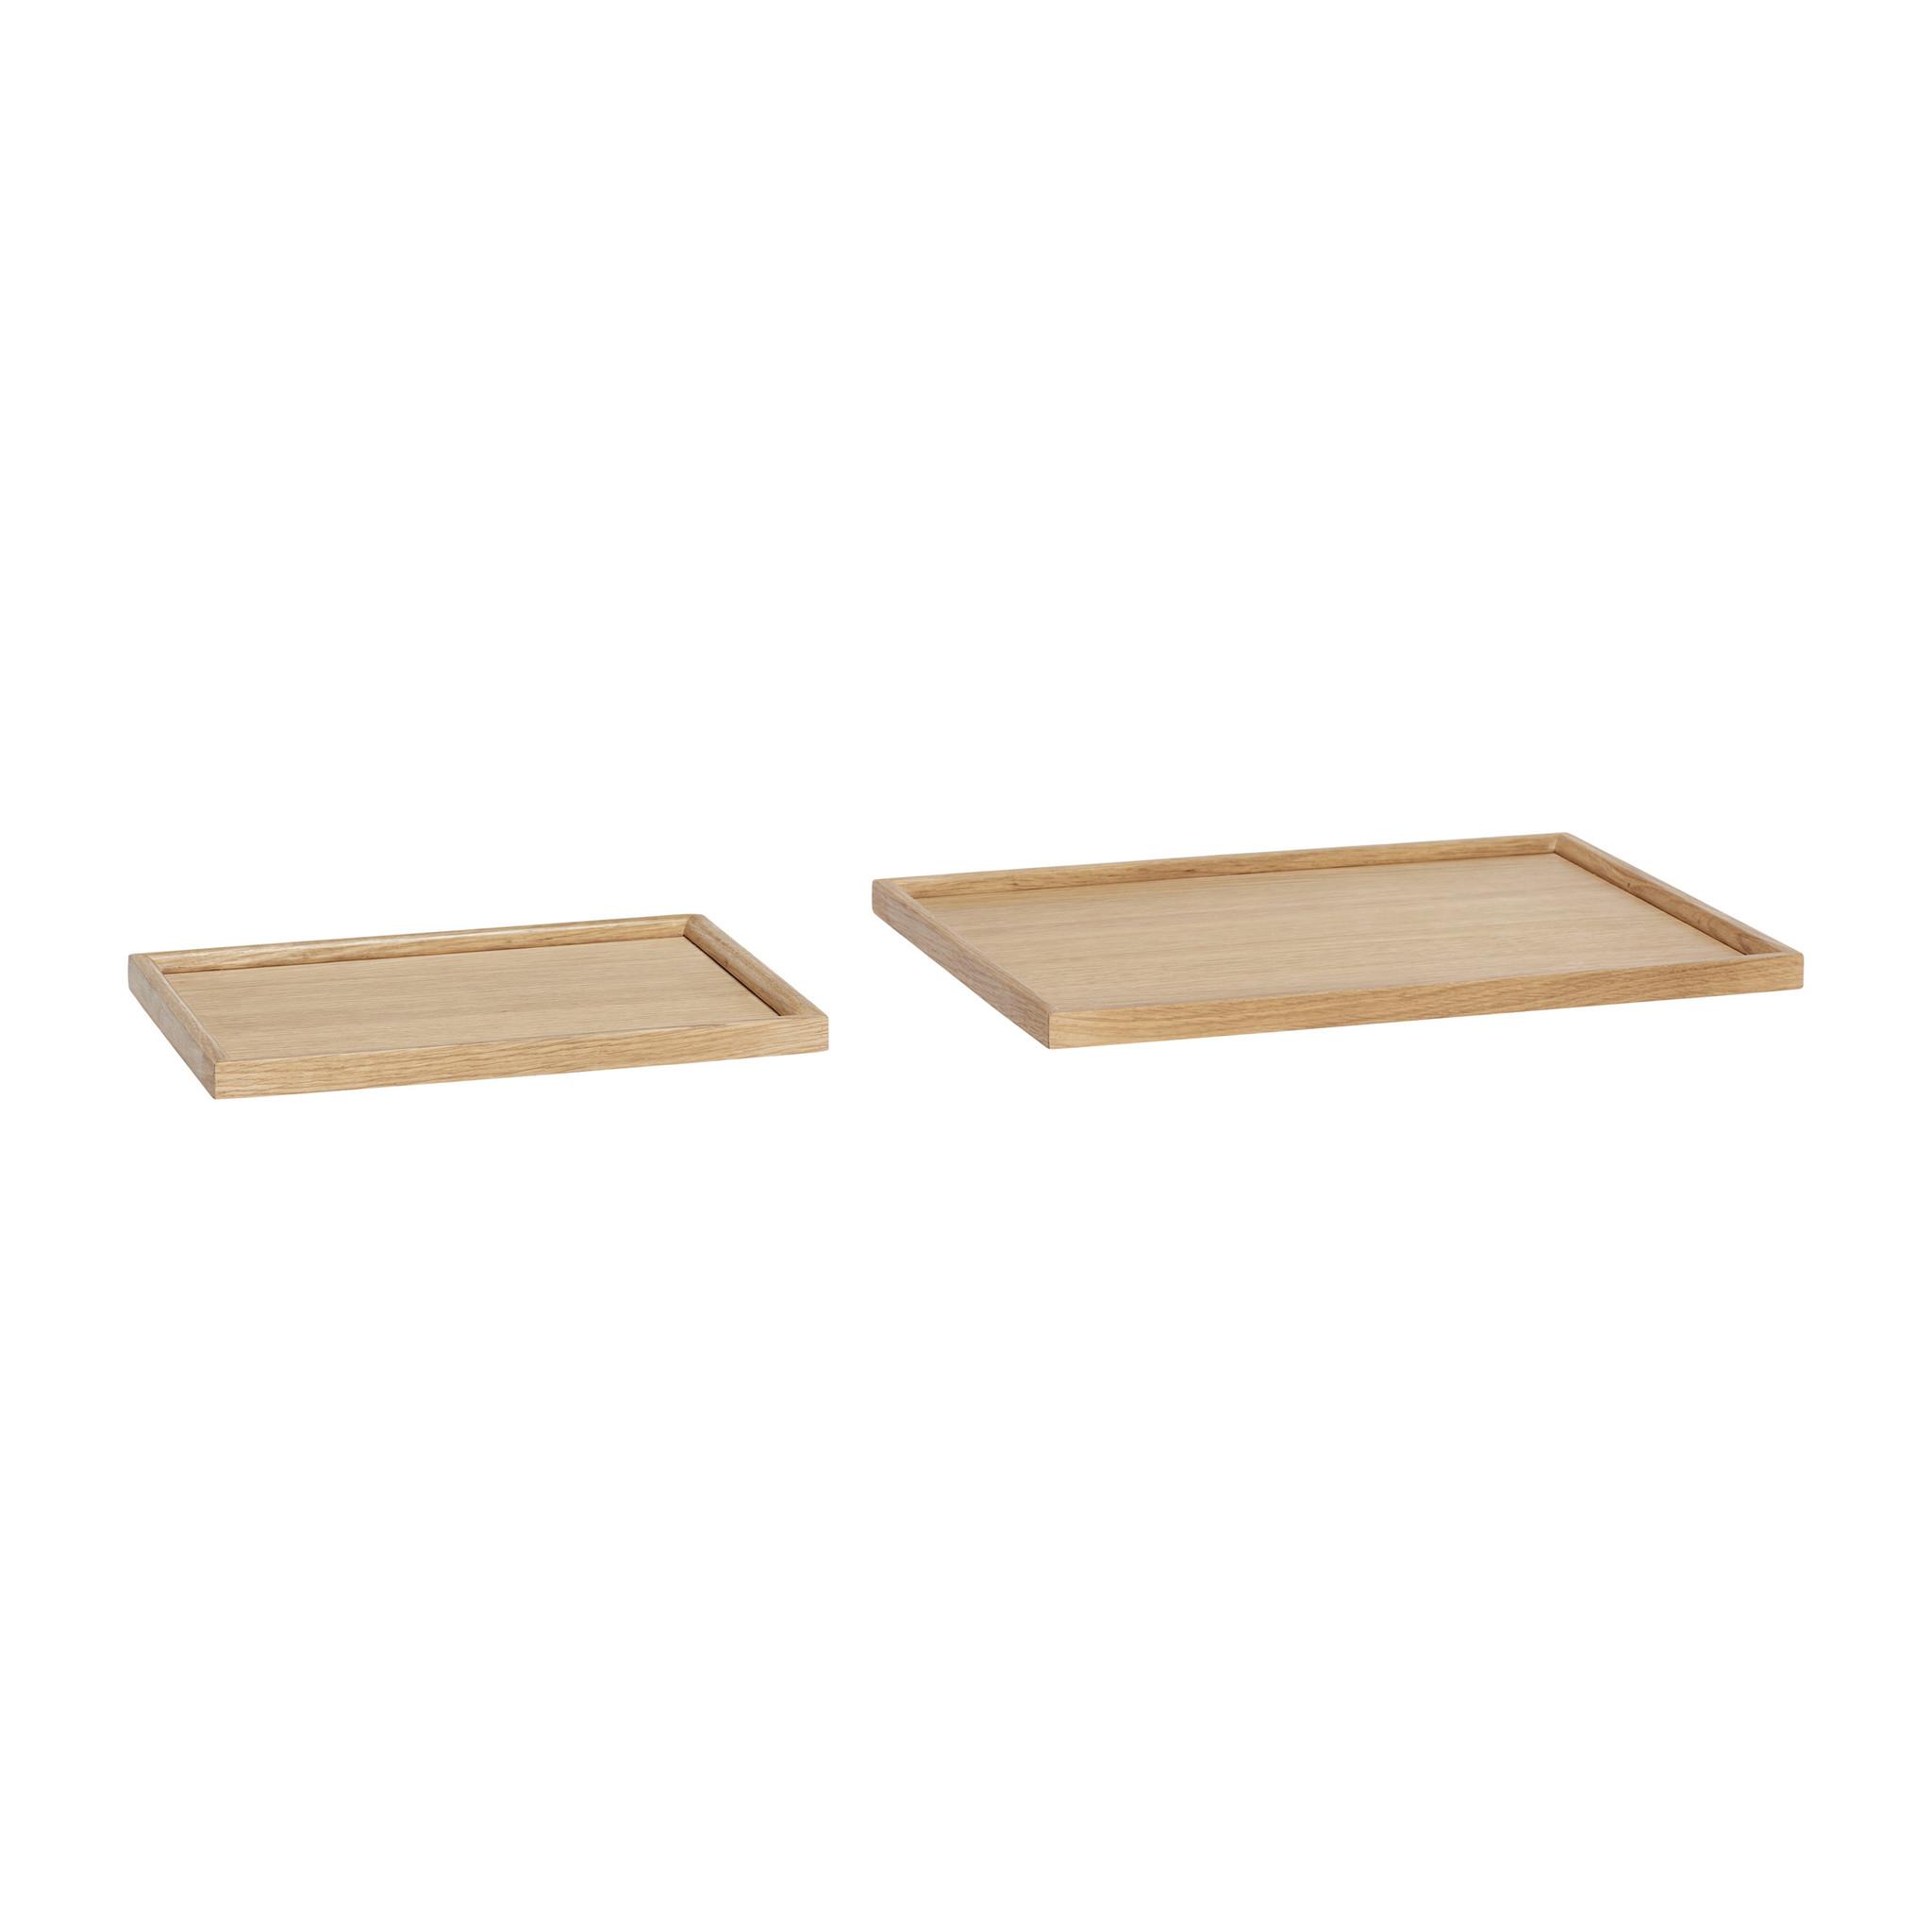 Hubsch Dienblad, hout, set van 2-880730-5712772066669